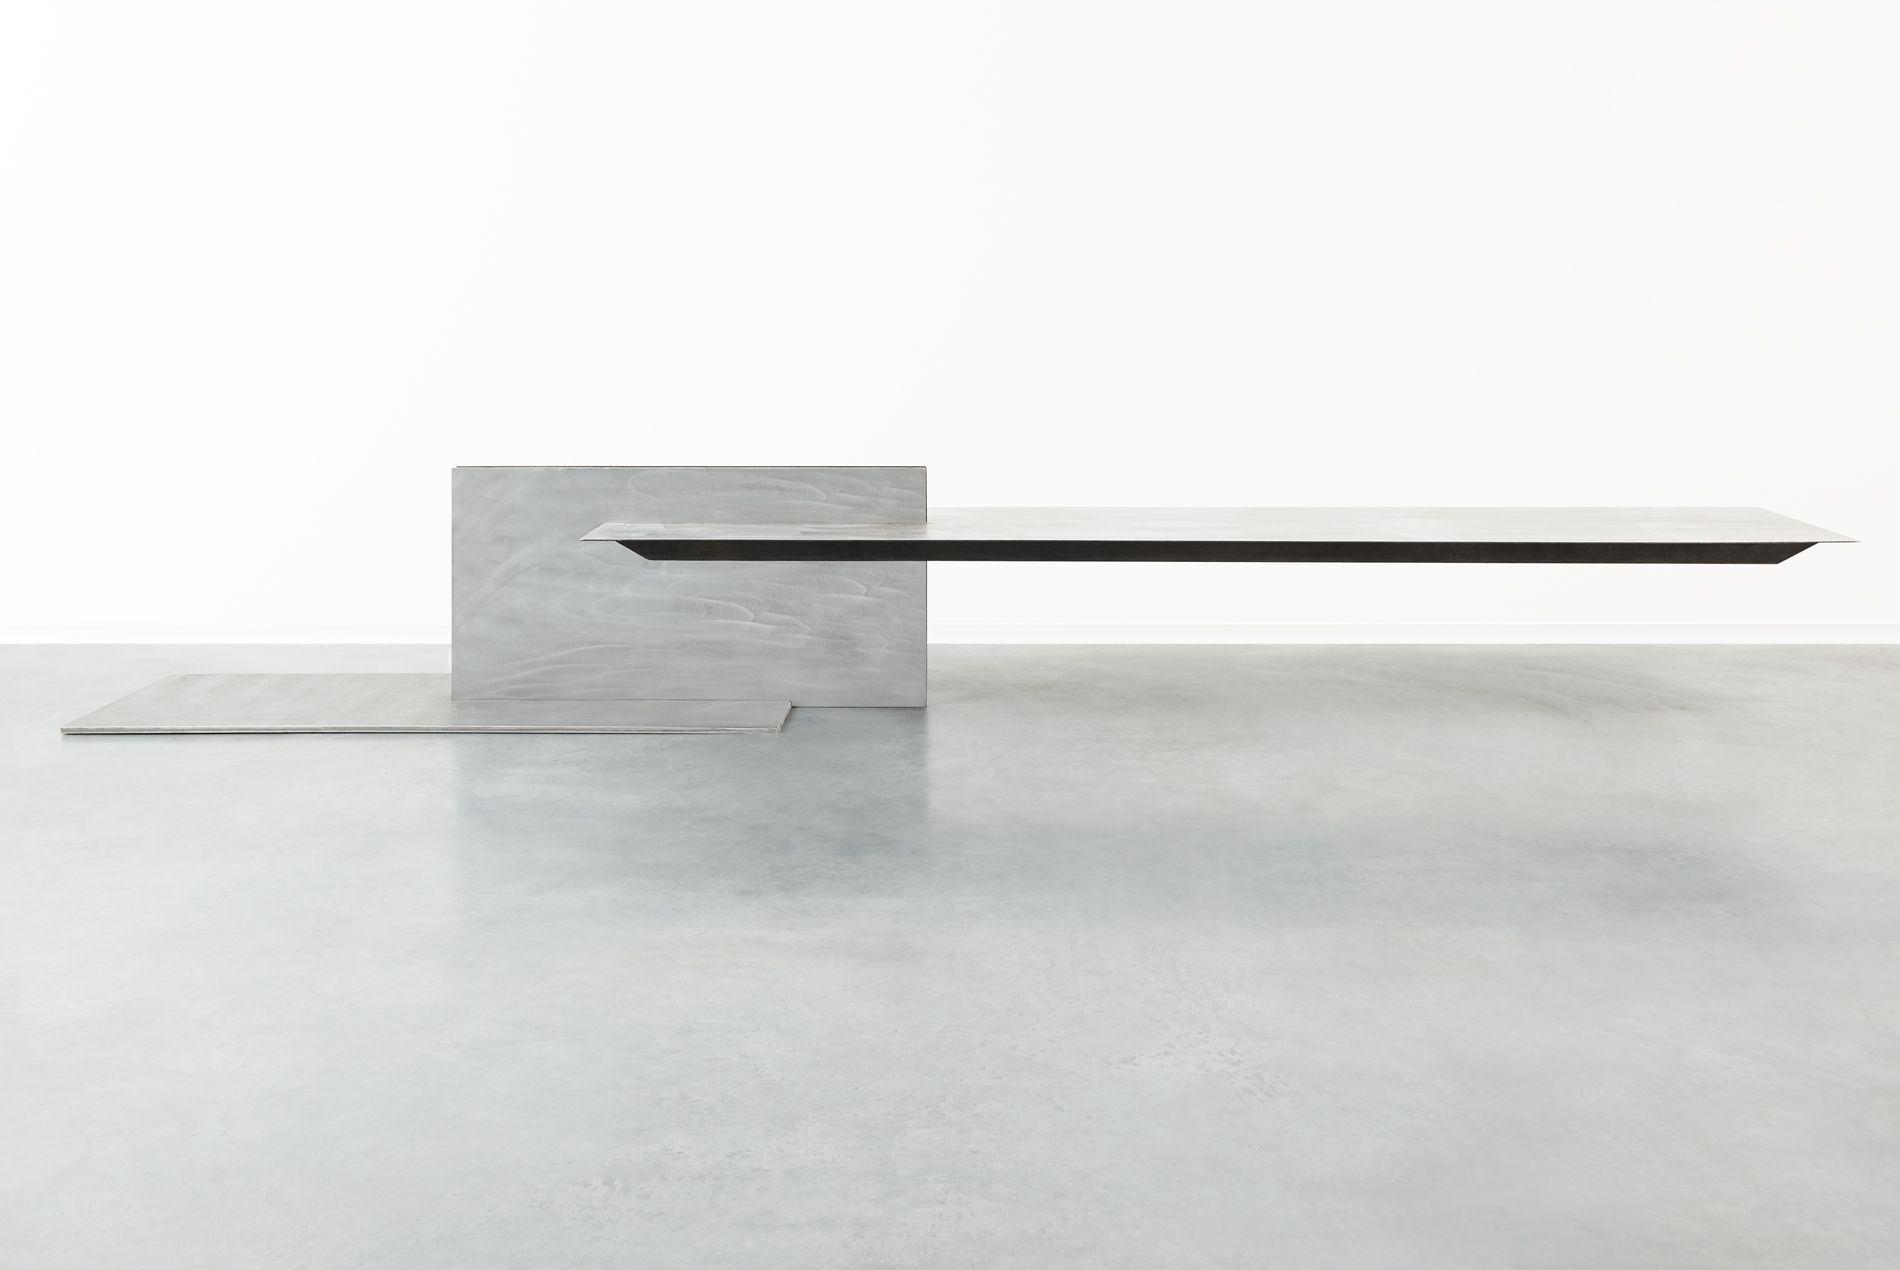 Pin By Nancy Parmentier On Design Diseno Light Iluminacion Marble Furniture Interior Furniture Marble Furniture Design [ 1270 x 1900 Pixel ]